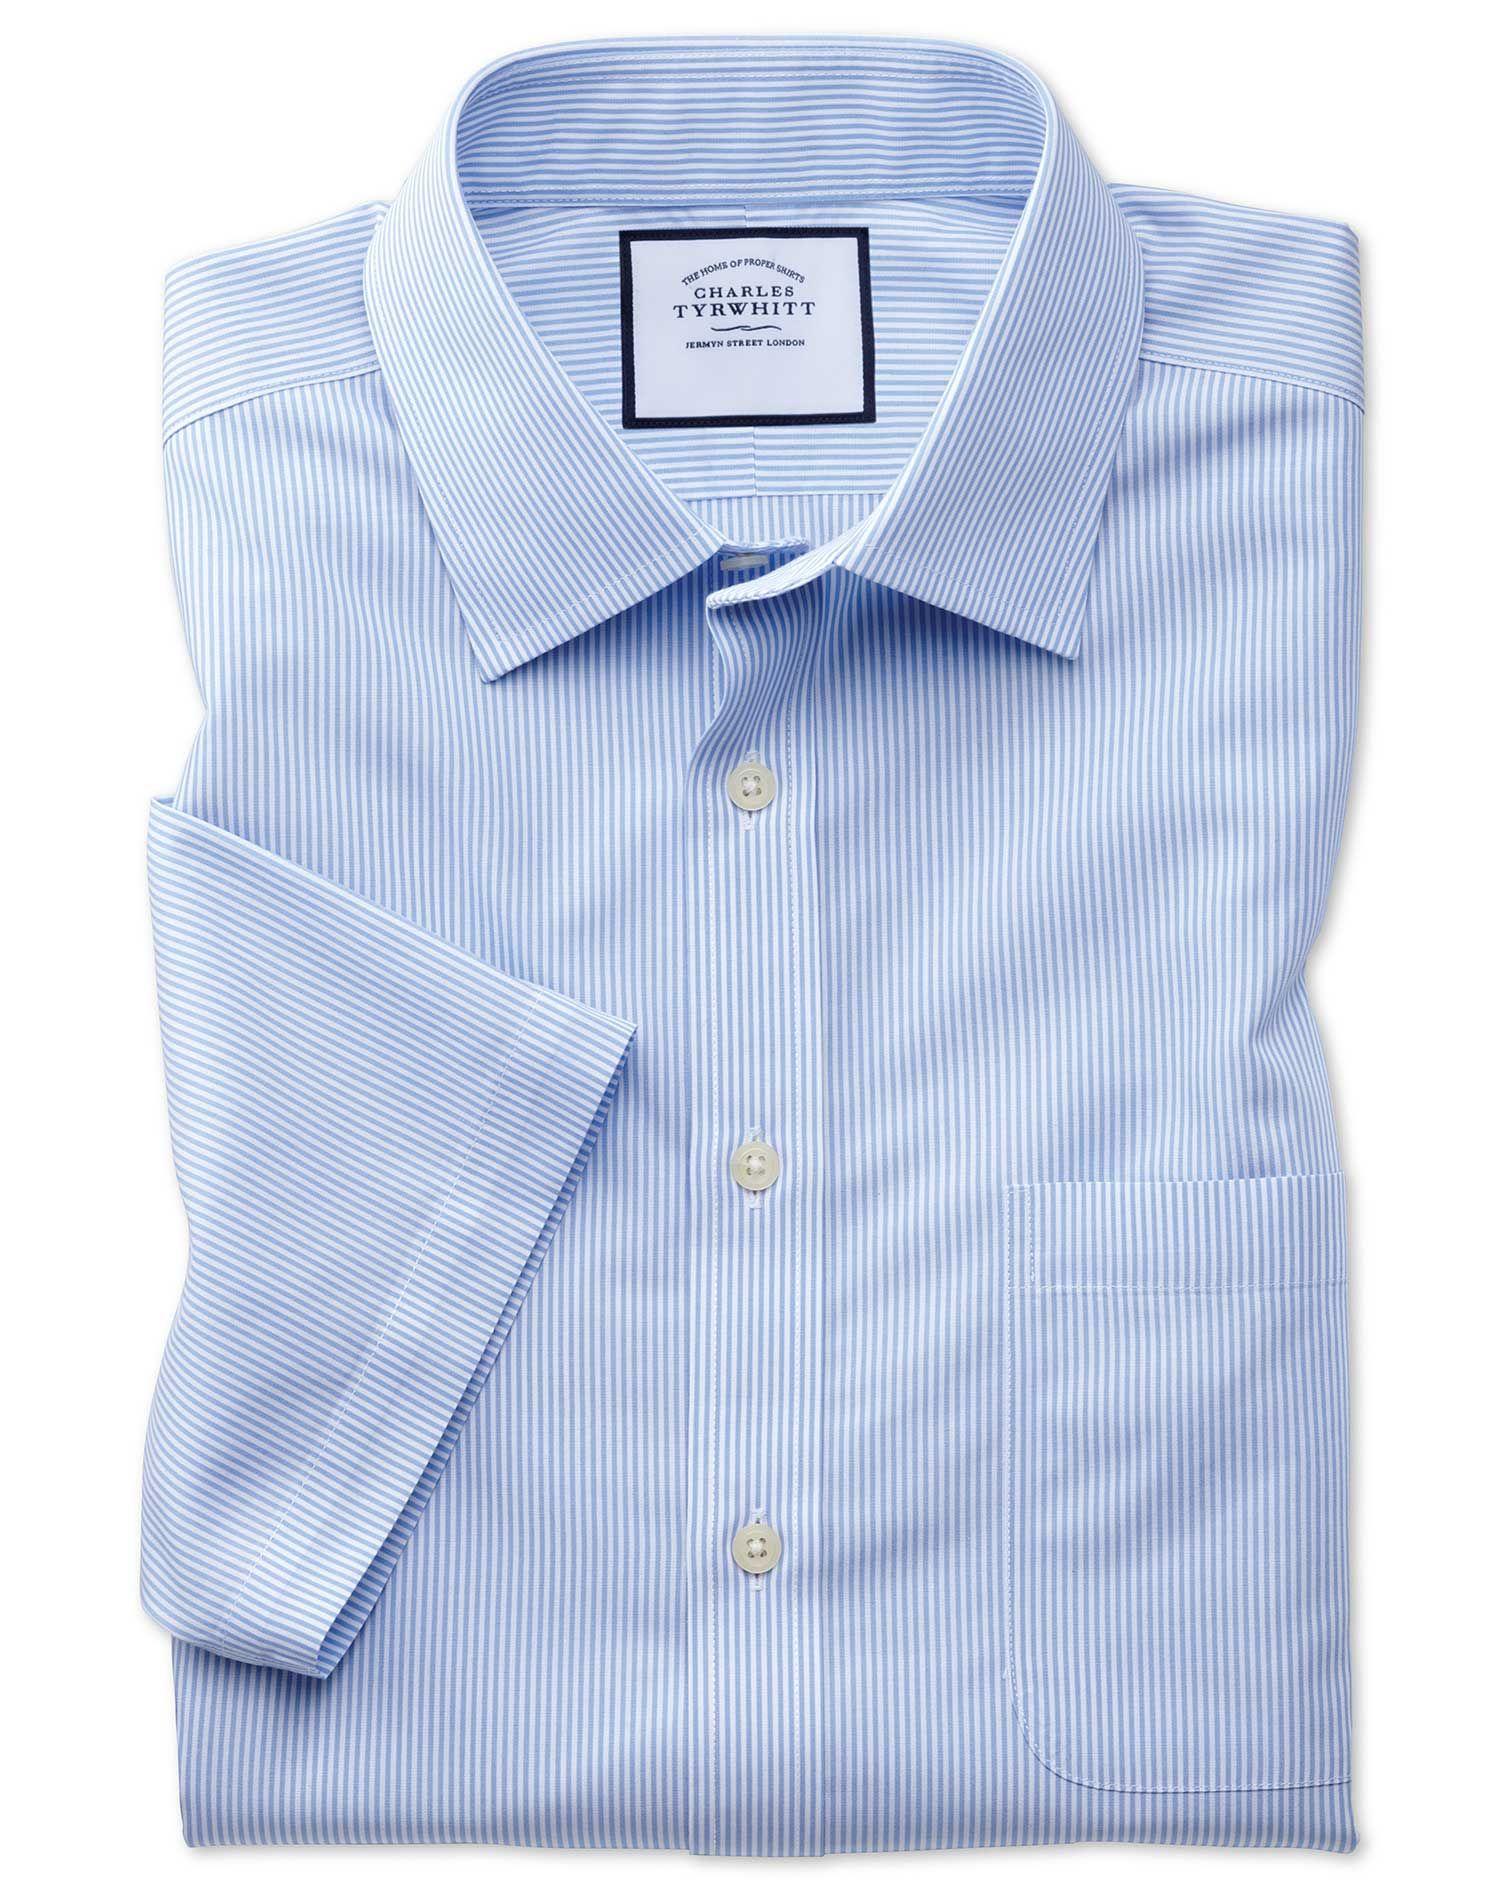 Slim Fit Non-Iron Sky Blue Bengal Stripe Short Sleeve Cotton Dress Shirt Size 15/Short by Charles Tyrwhitt #shortsleevedressshirts